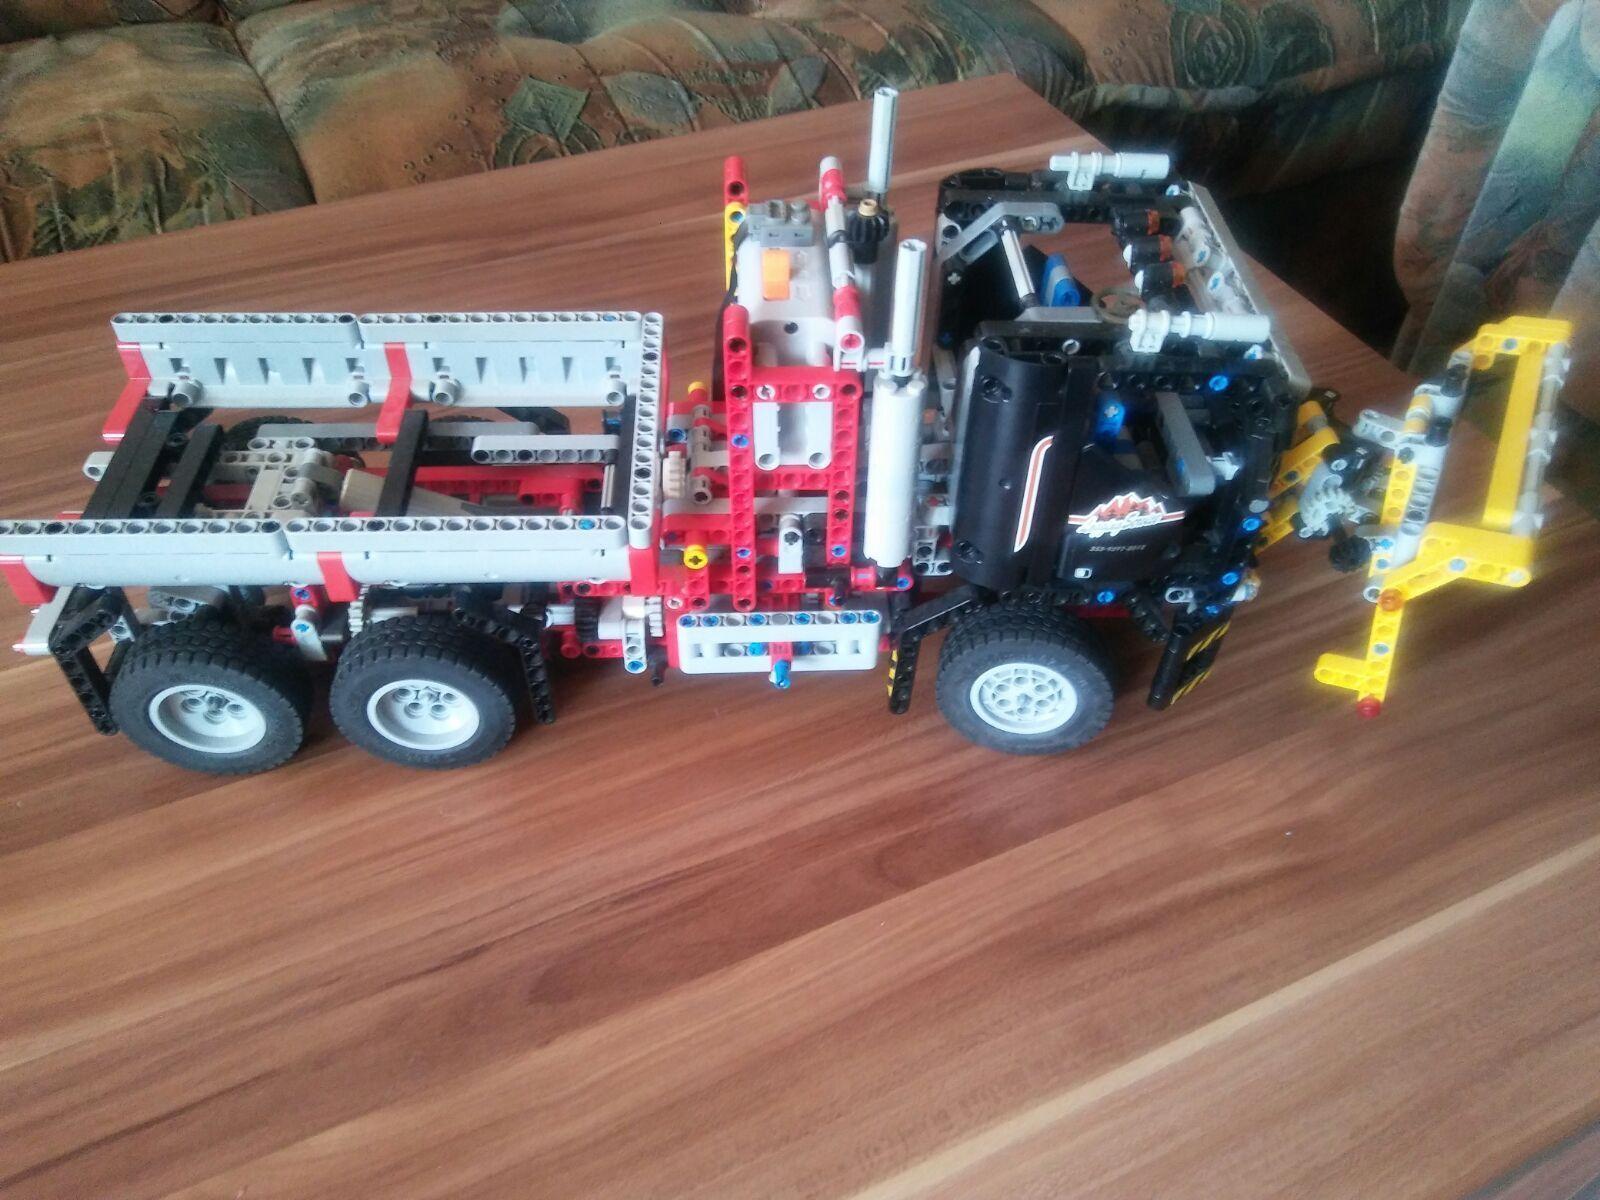 9397 günstig kaufen LEGO Technic Holztransporter